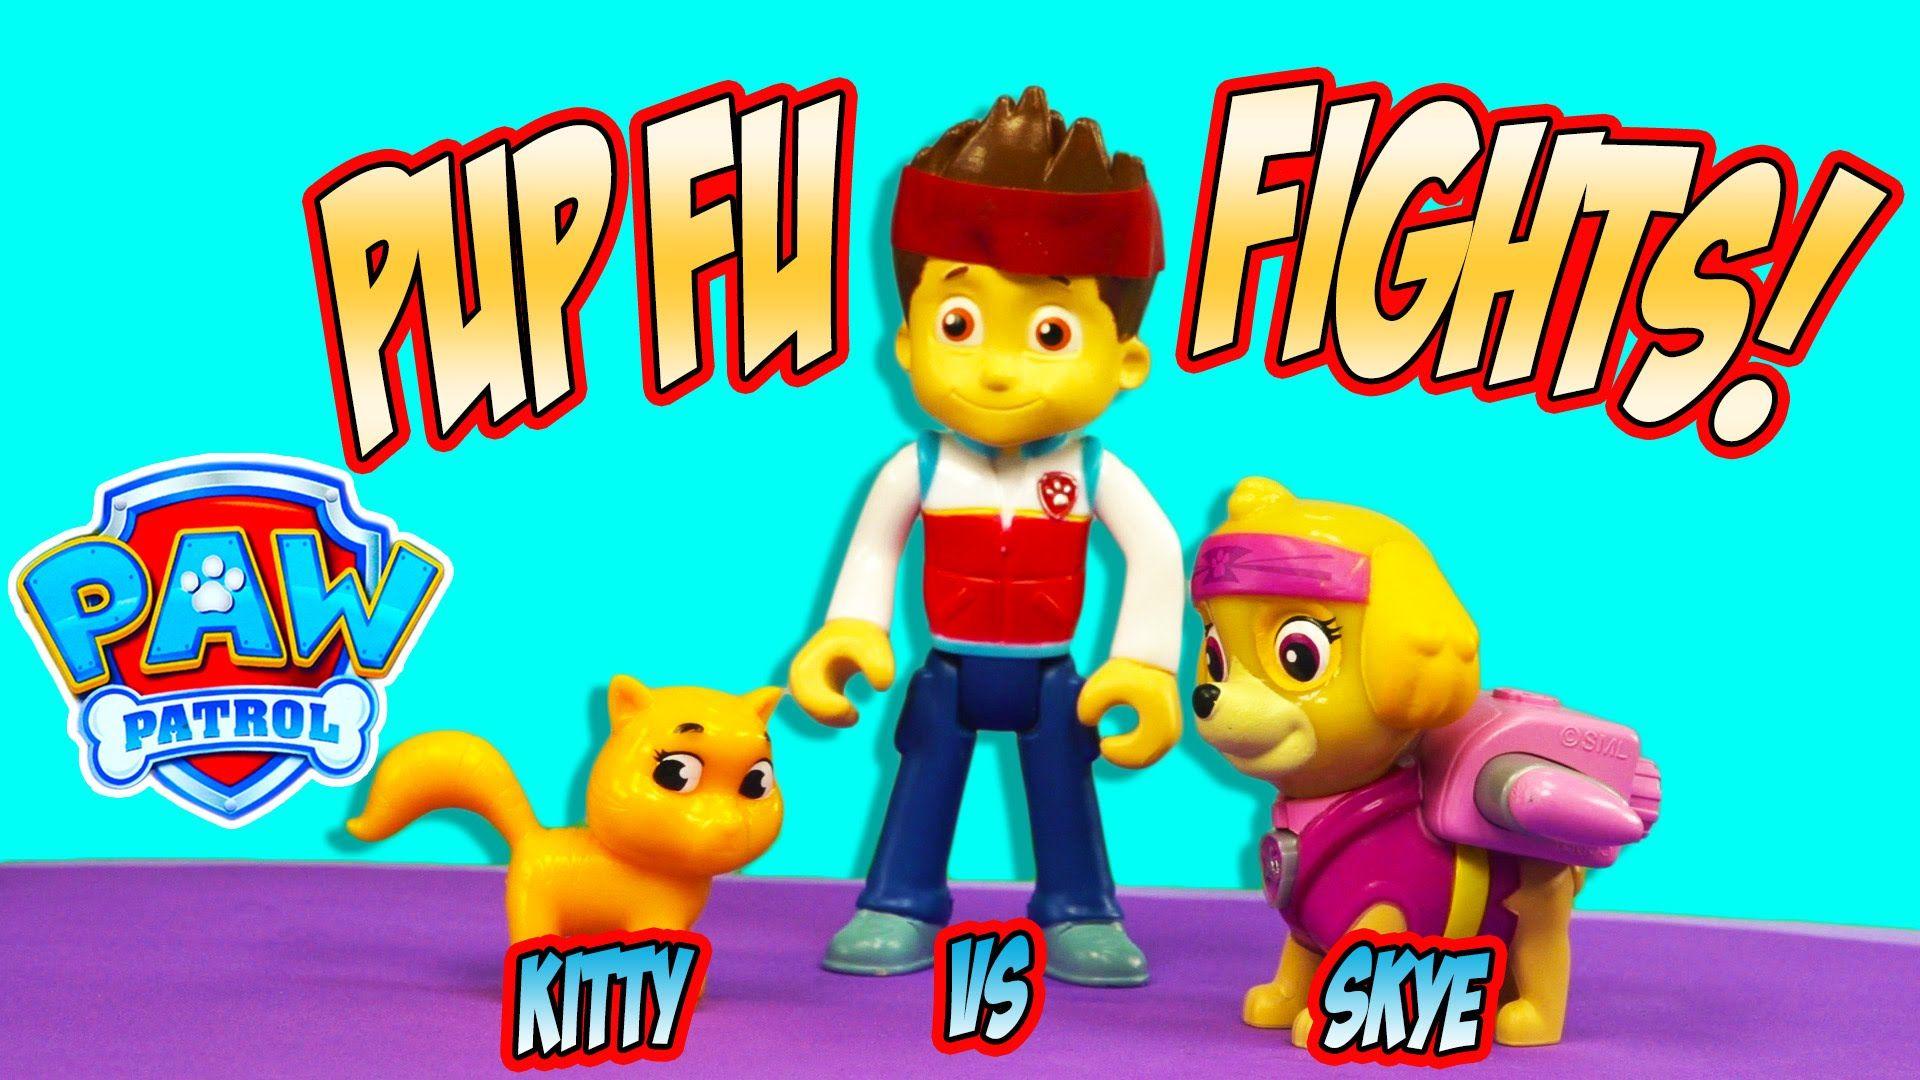 PAW PATROL PUP FU KUNG FU FIGHTS PRECIOUS THE KITTY VS